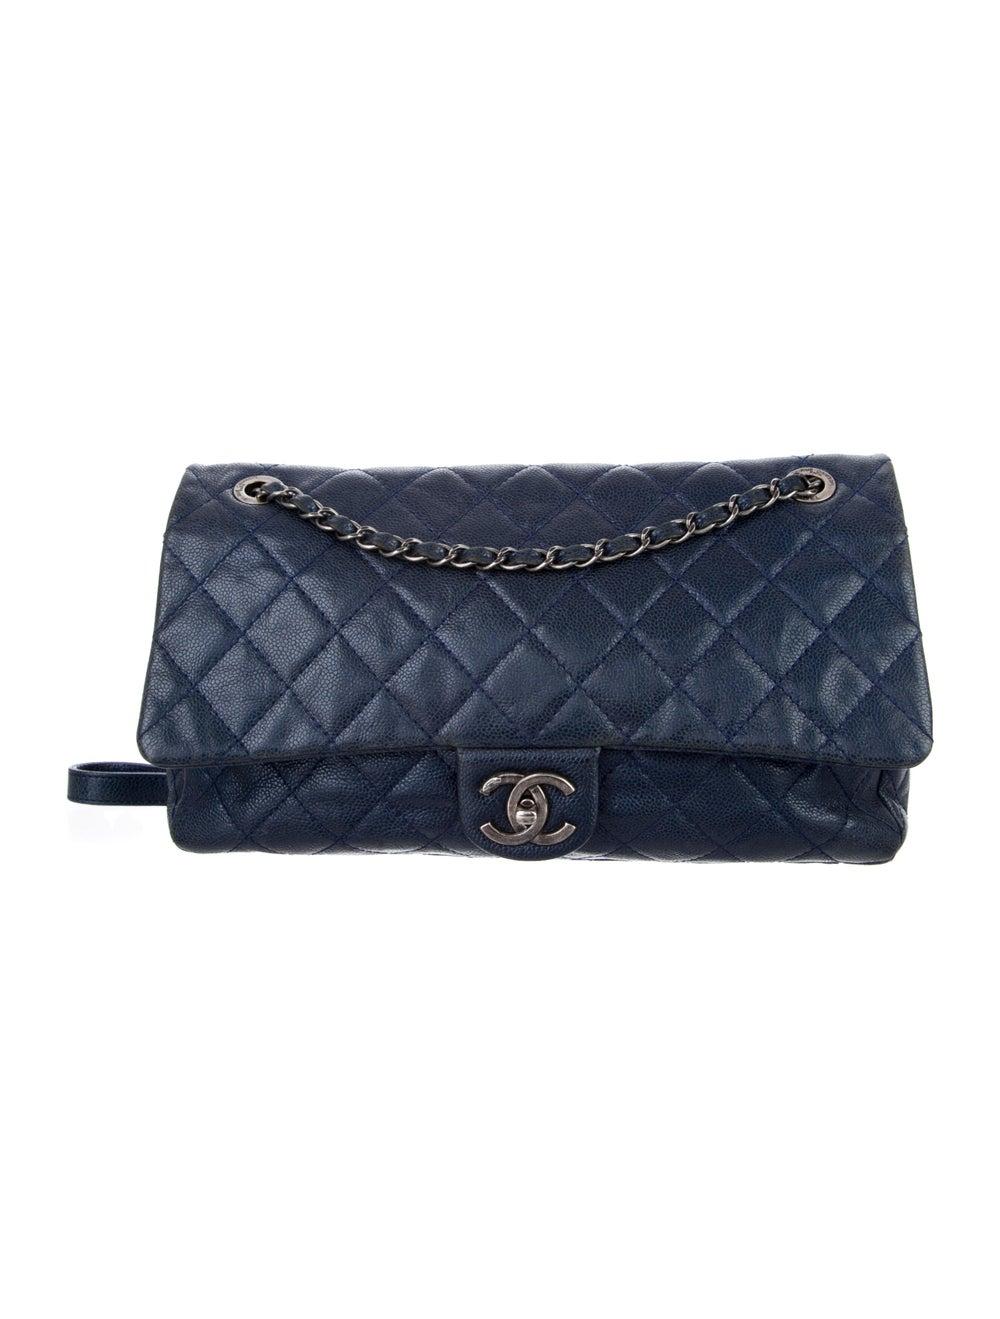 Chanel Jumbo Easy Caviar Flap Bag Blue - image 1